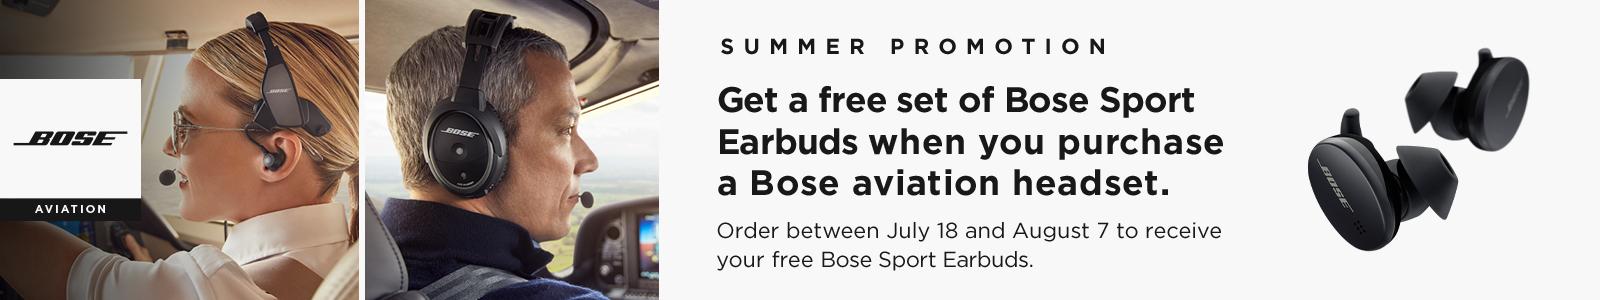 Bose Summer Promotion A20 Proflight Series 2